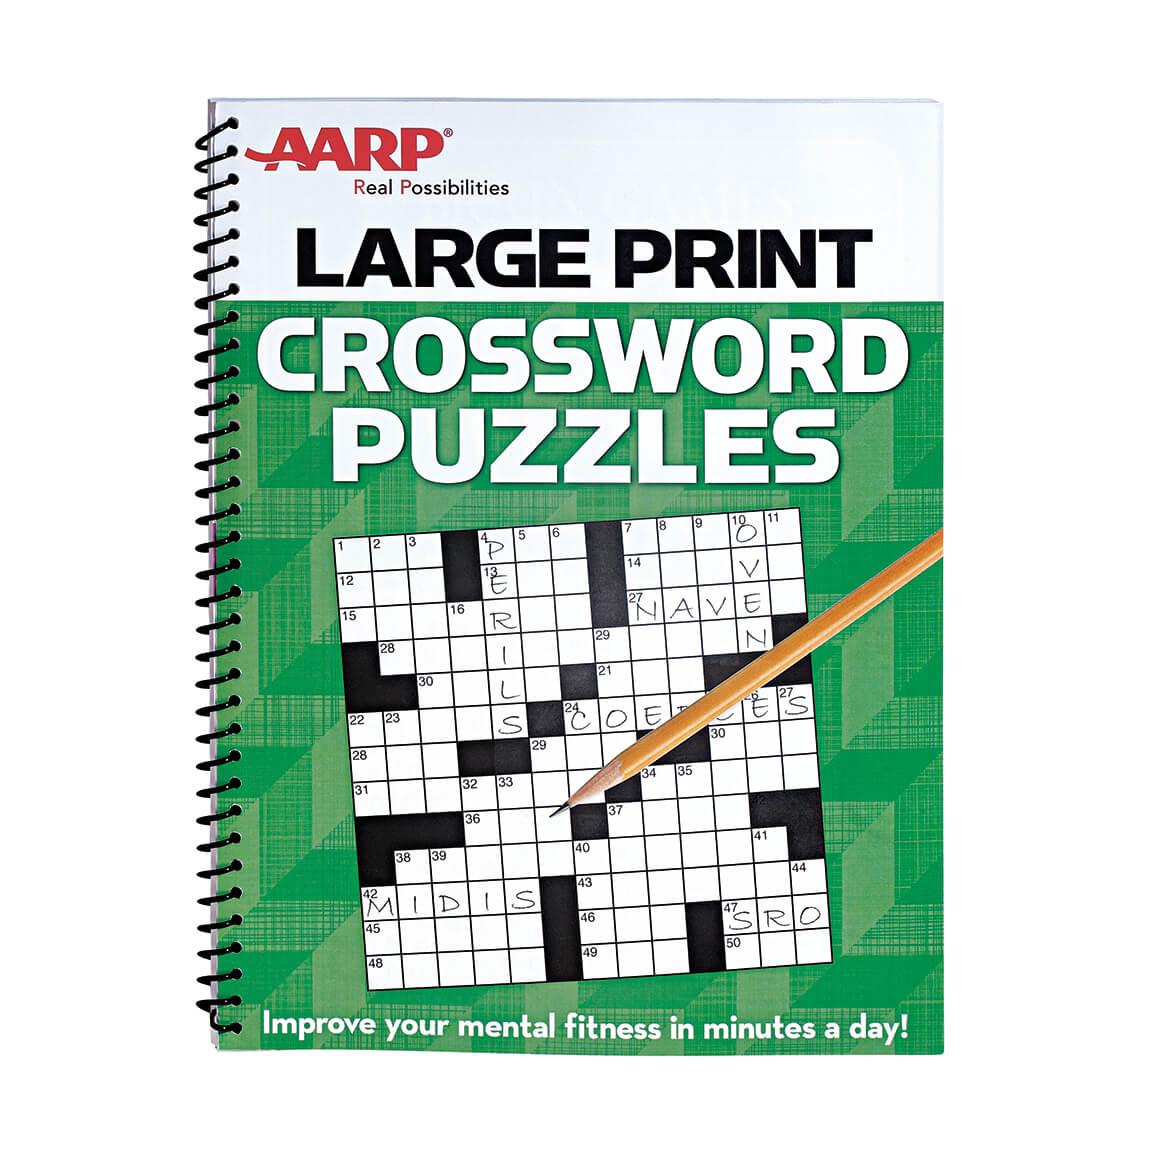 Large Print Crossword Puzzles - Crossword Puzzles - Miles Kimball - Large Print Crossword Puzzles Visually Impaired